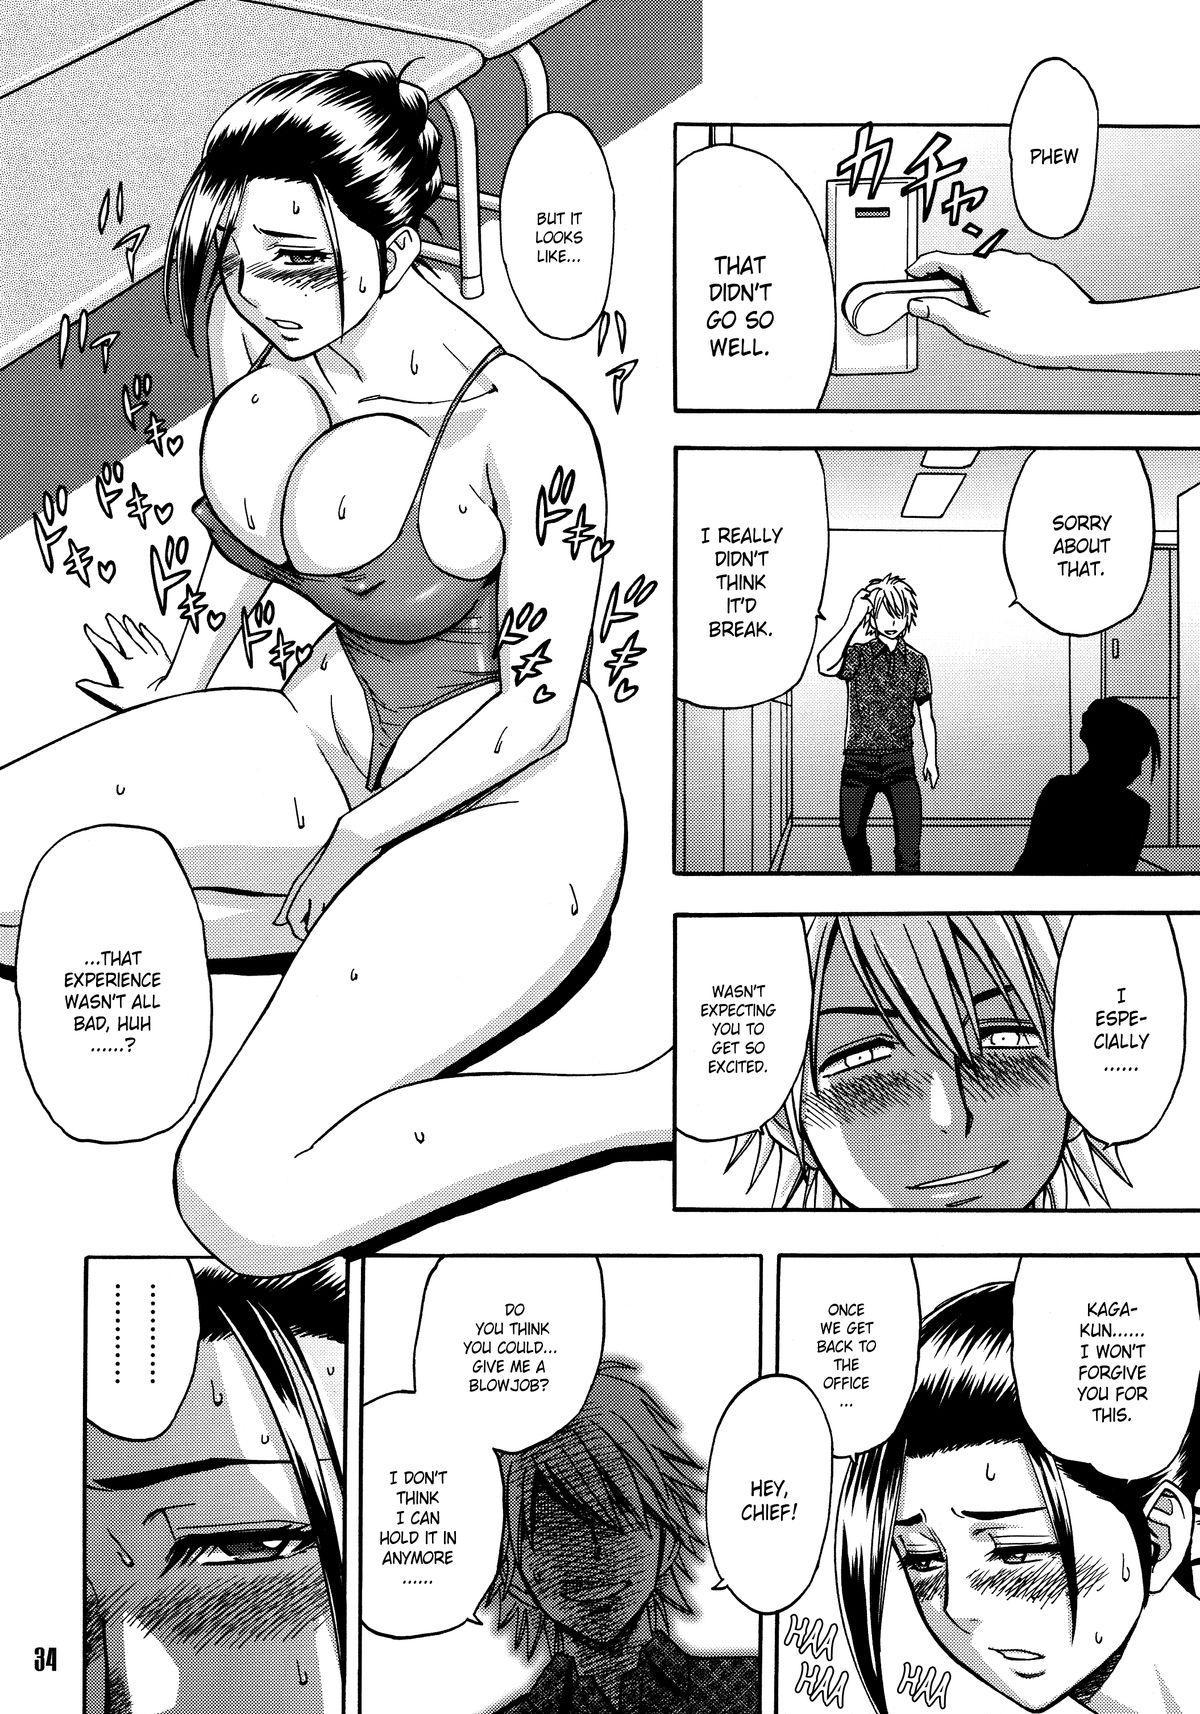 [Madam Project (Tatsunami Youtoku)] Bijin Henshuu-chou no Himitsu (1)   Beautiful Editor-in-Chief's Secret (1) [English] [Forbiddenfetish77] [Decensored] 33